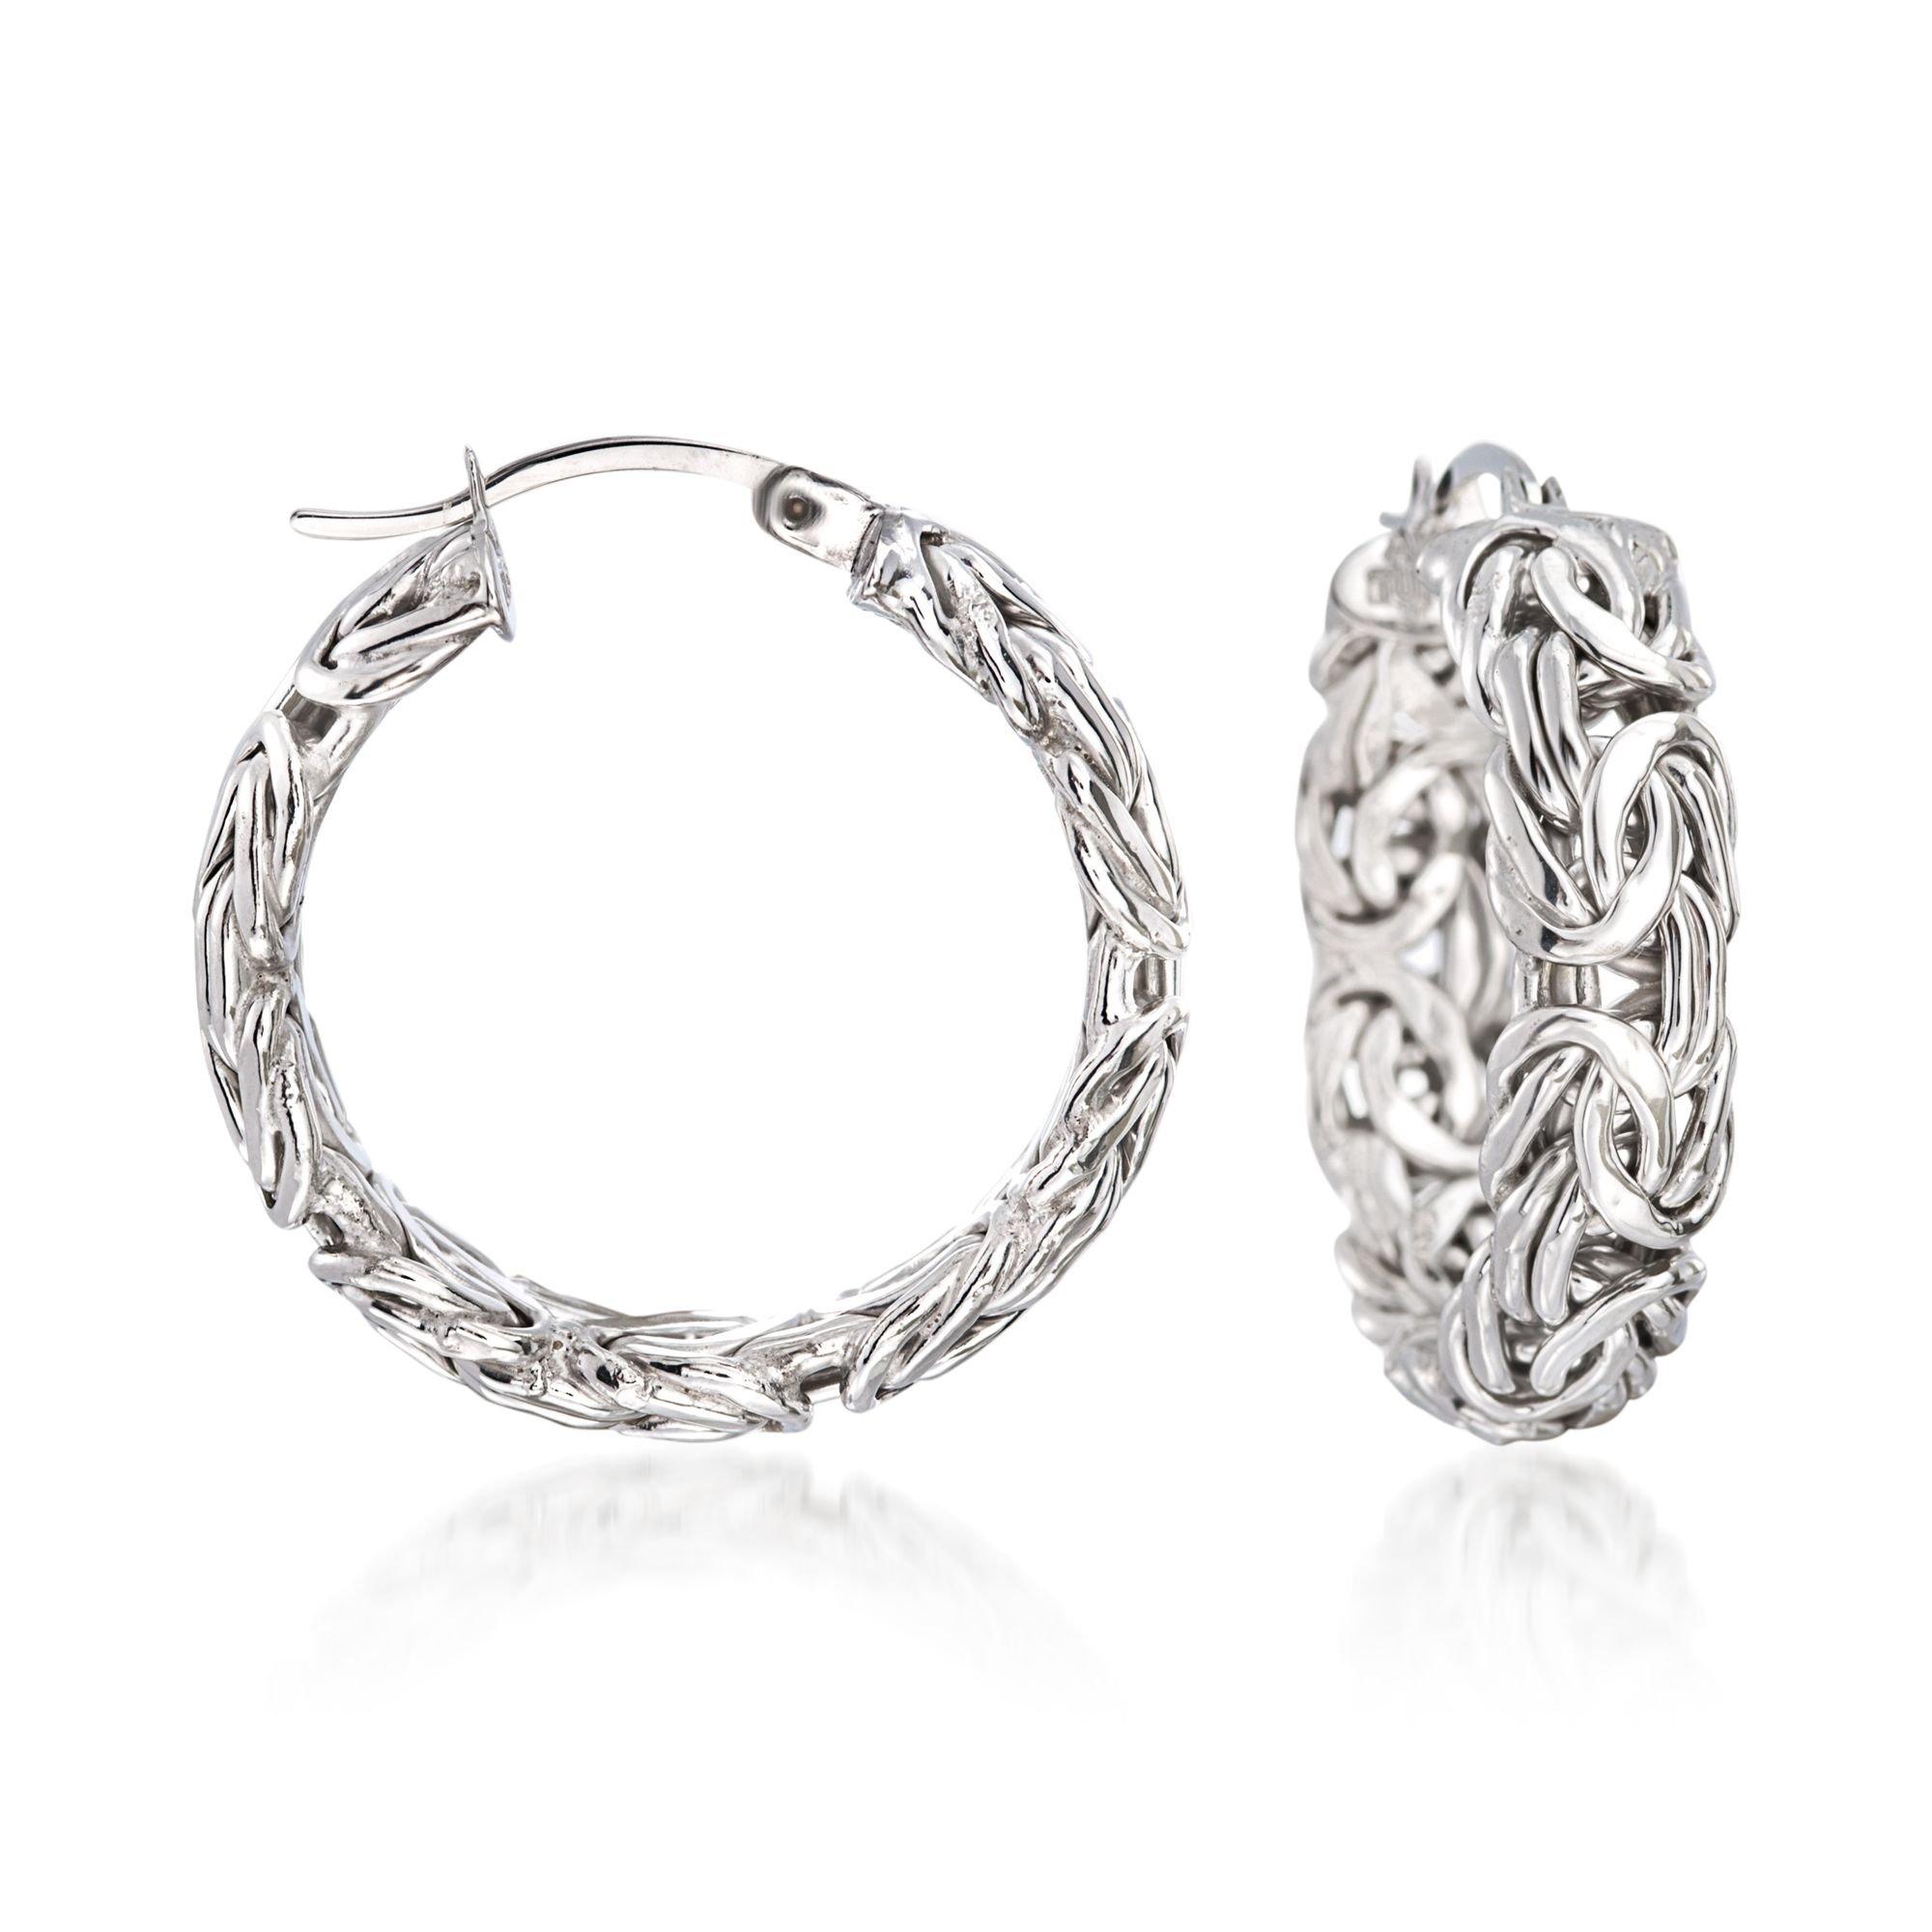 Ross-Simons Sterling Silver Small Byzantine Hoop Earrings